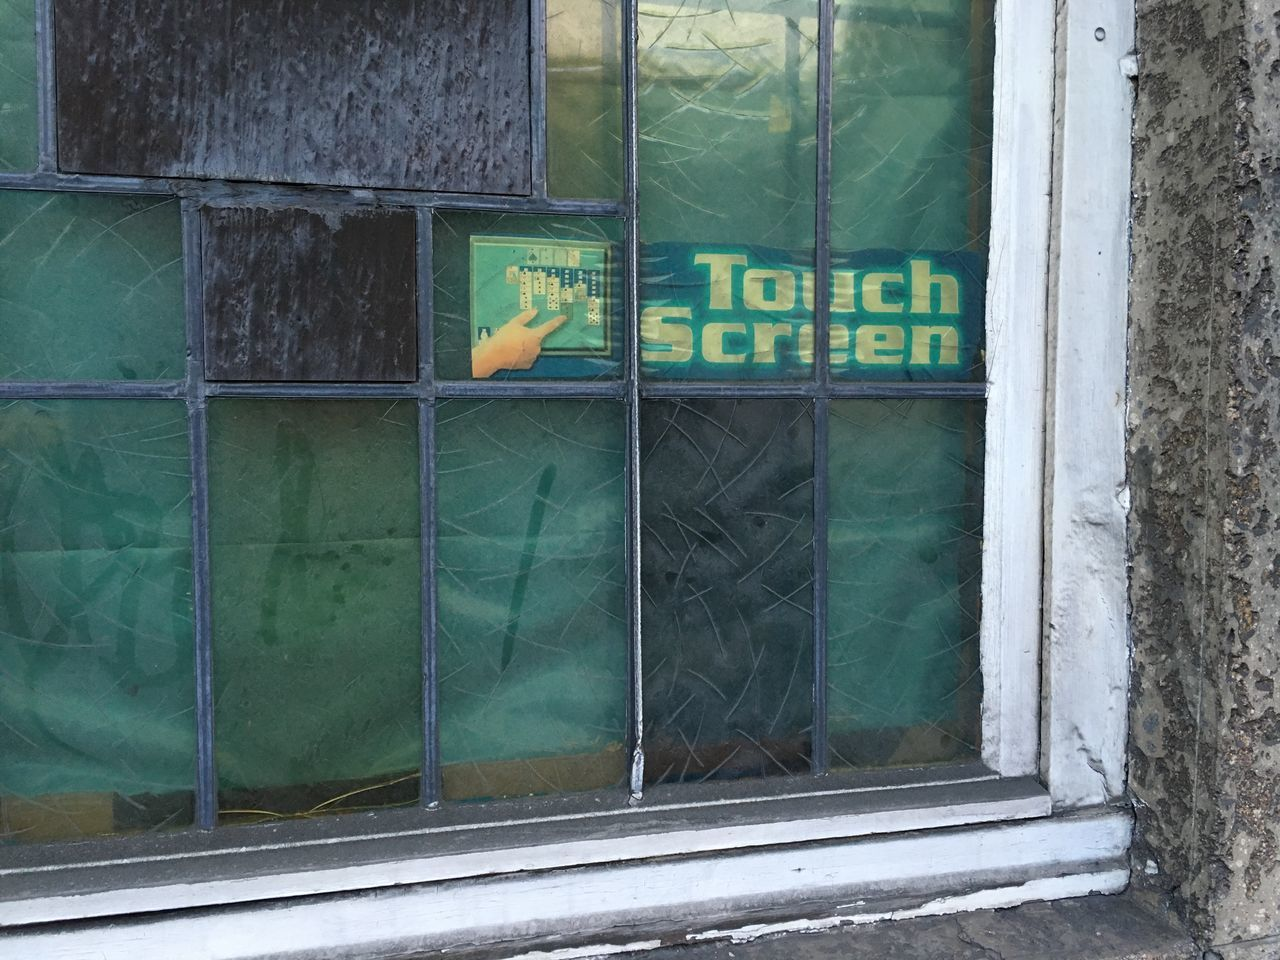 Touch screen? Bar Dirty Window Gambling Gambling Room Green Color Hand Pub Touch Screen Touch Screen And Hands Window